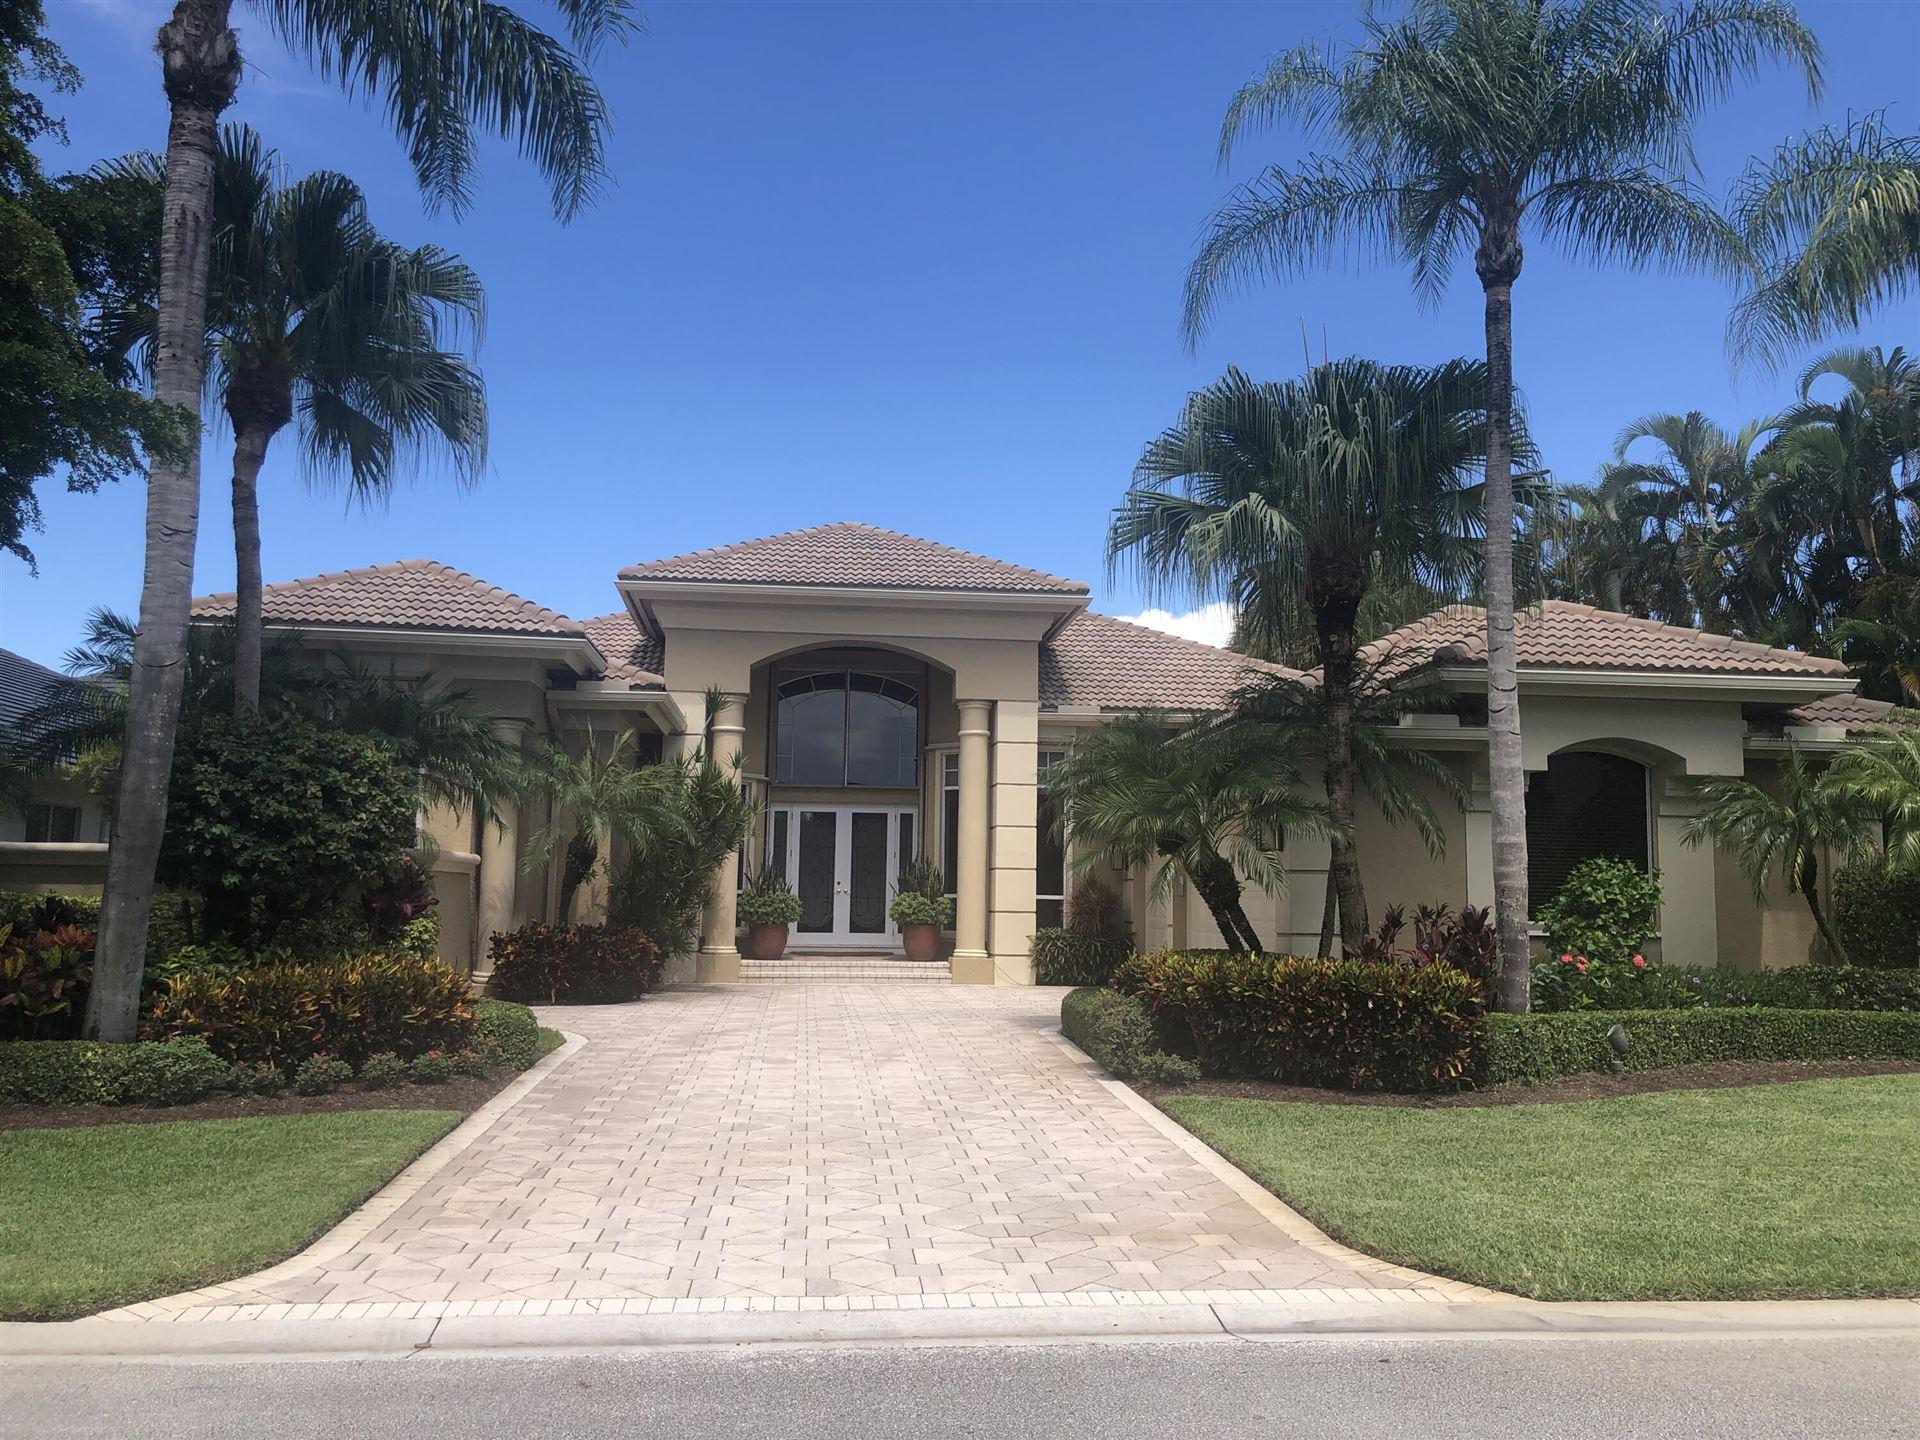 Photo of 1022 Grand Isle Terrace, Palm Beach Gardens, FL 33418 (MLS # RX-10738478)